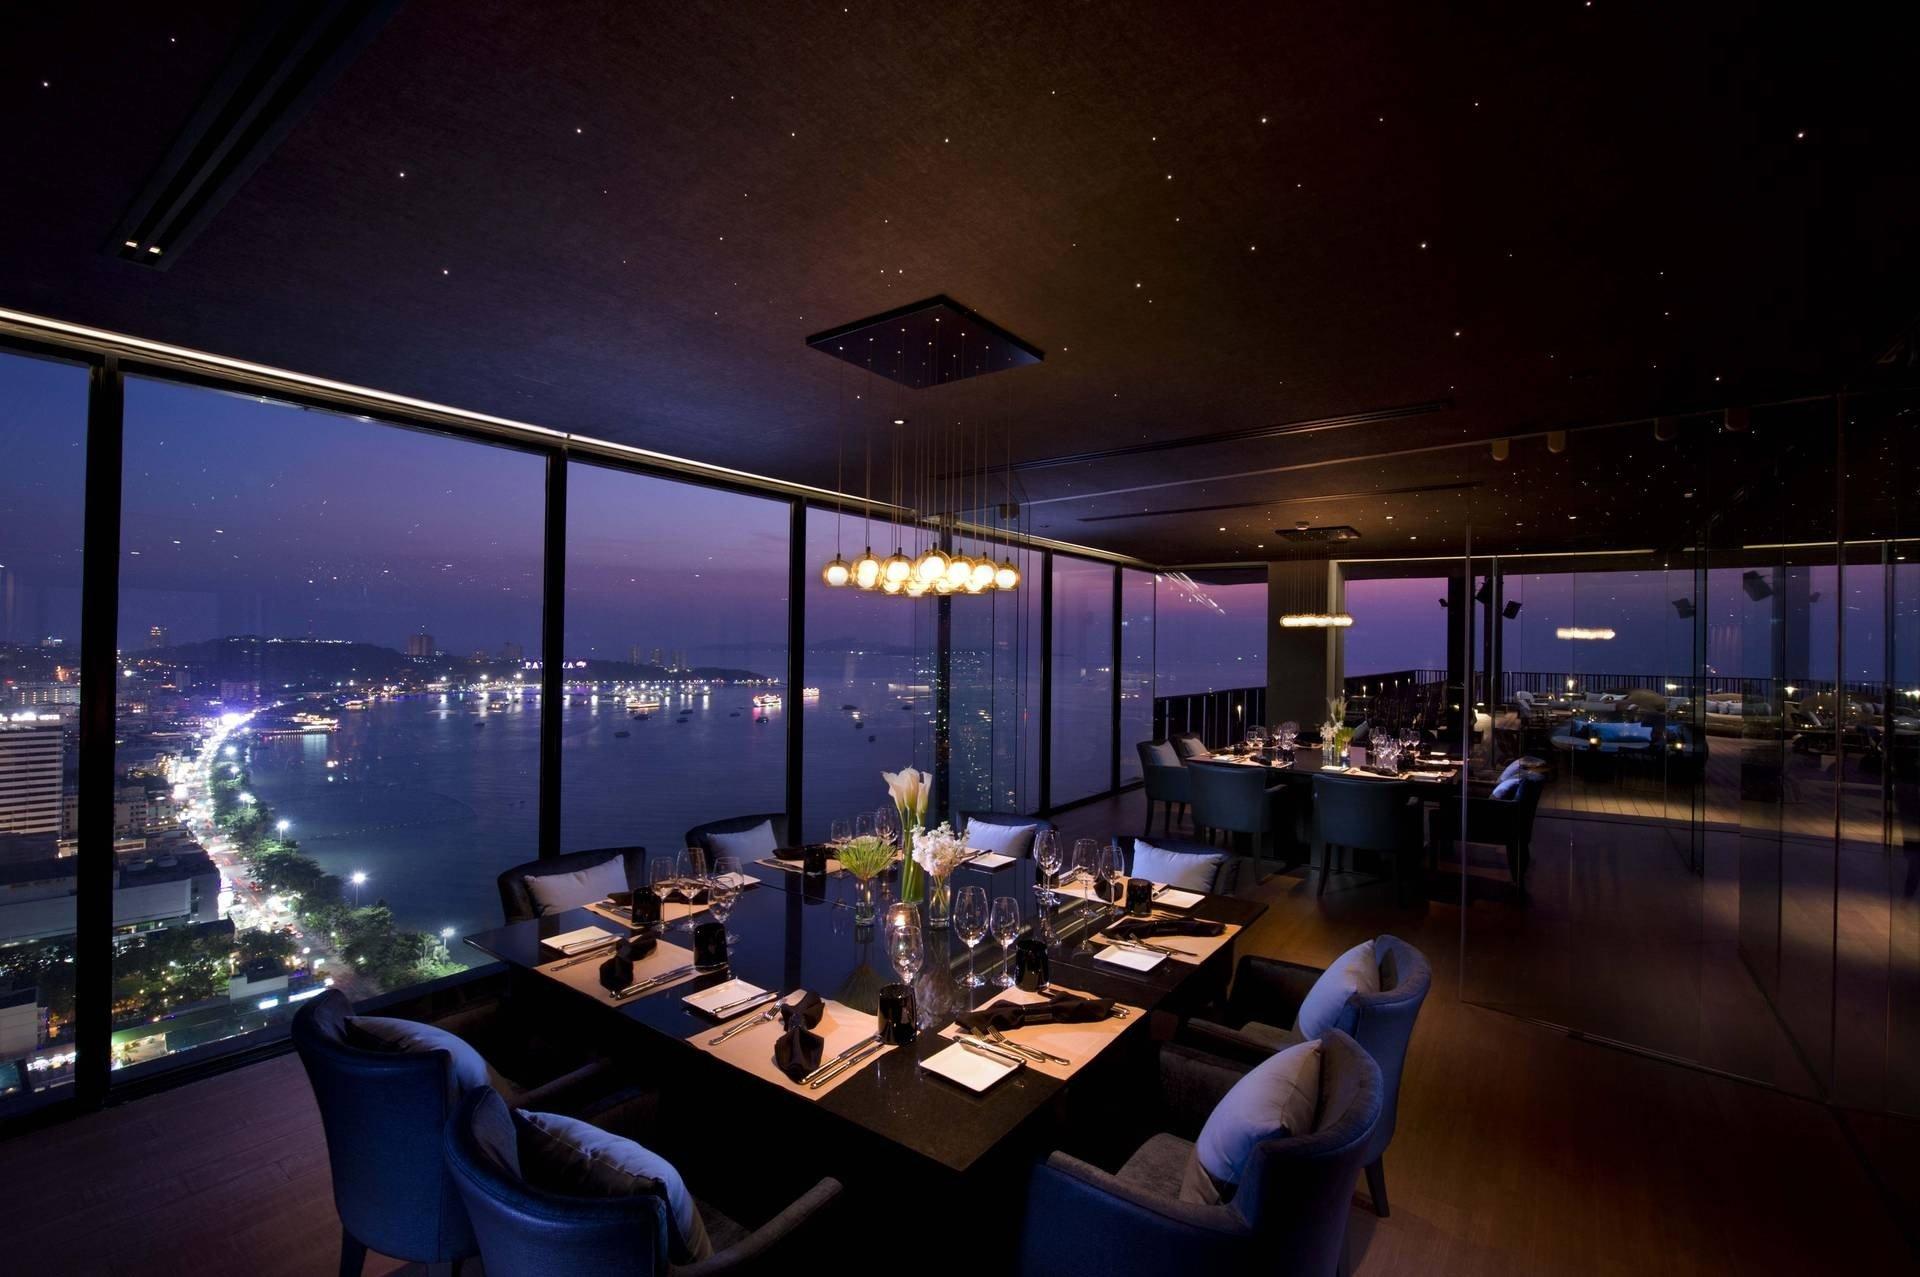 Horizon Rooftop Restaurant & Bar Hilton Pattaya